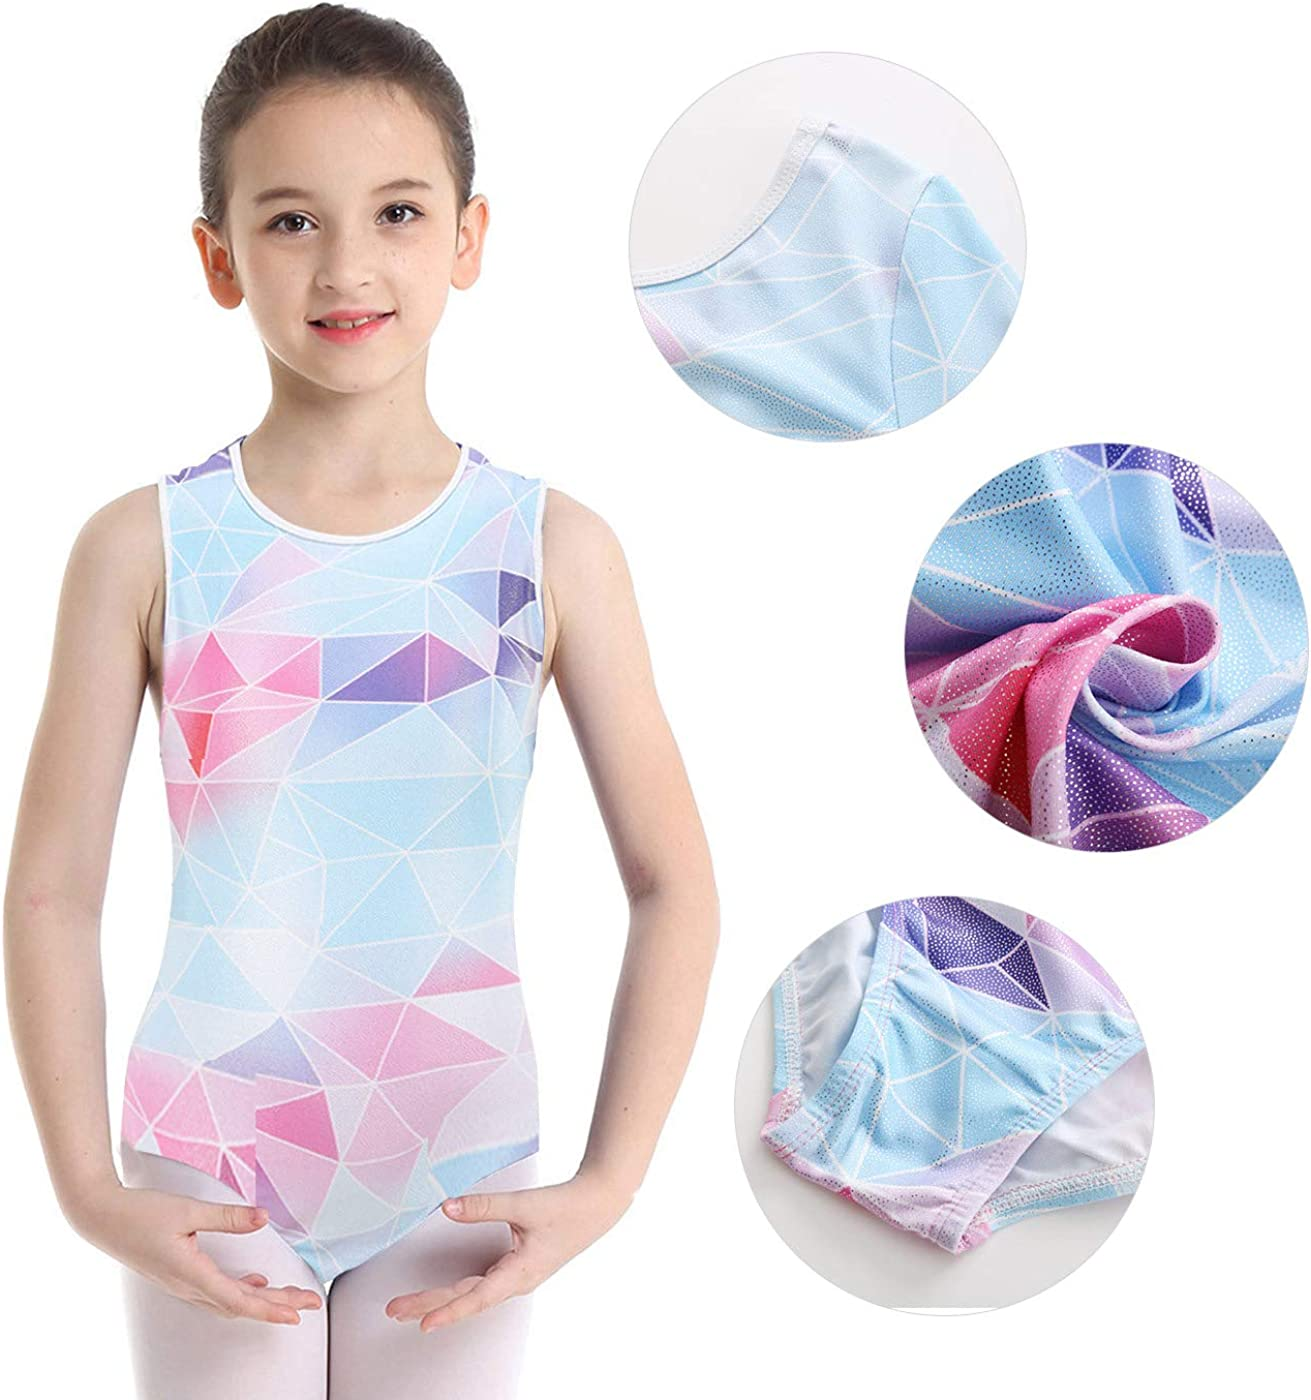 Happy Cherry Children Girls Gymnastics Leotards Sleeveless//Long Sleeve Shiny Sparkle Ballet Leotard Dancewear Practice Dancing Costume Multiple Colors 5-14 Years